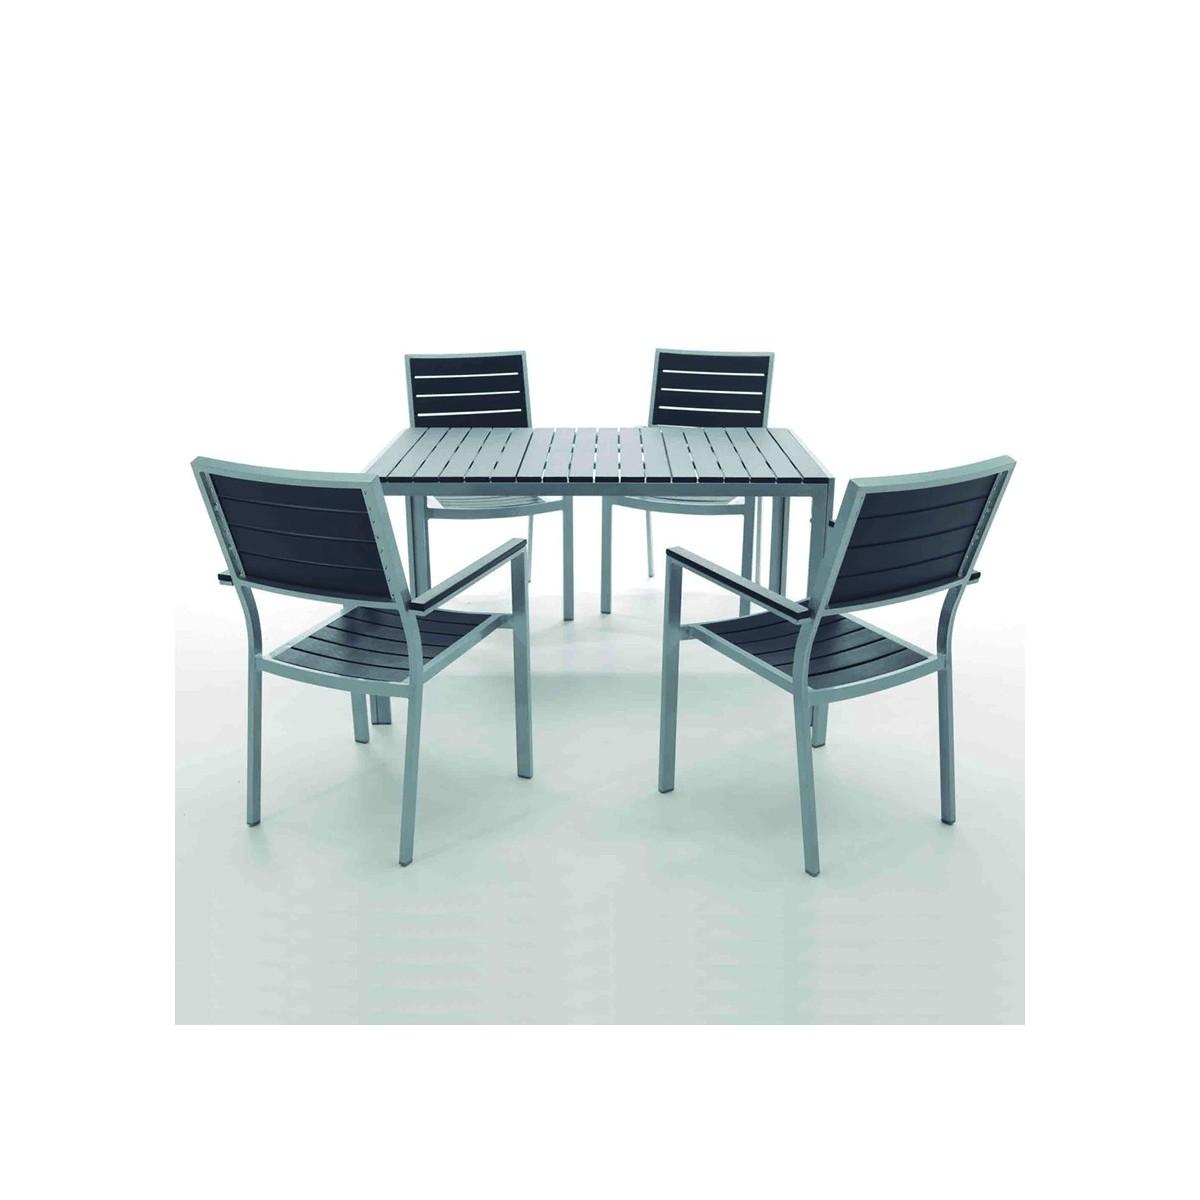 Muebles hevea benitachell obtenga ideas dise o de for Muebles de jardin en barcelona